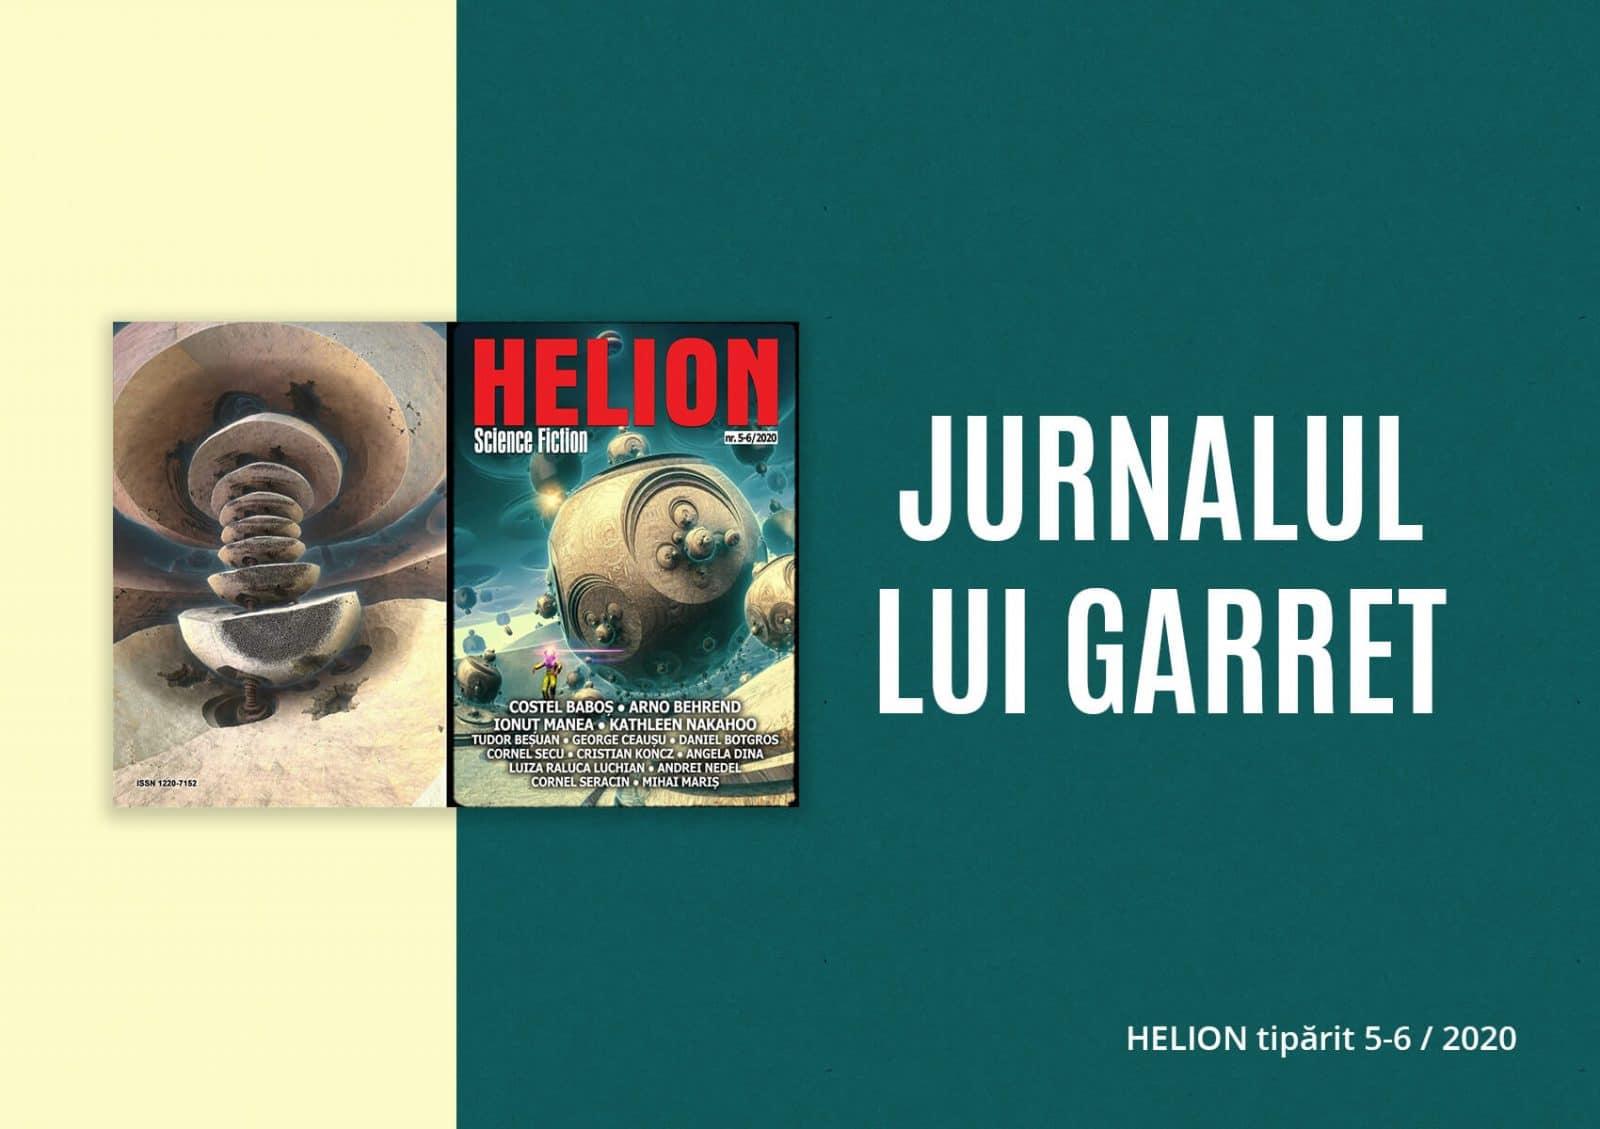 jurnalul-lui-garret-helion